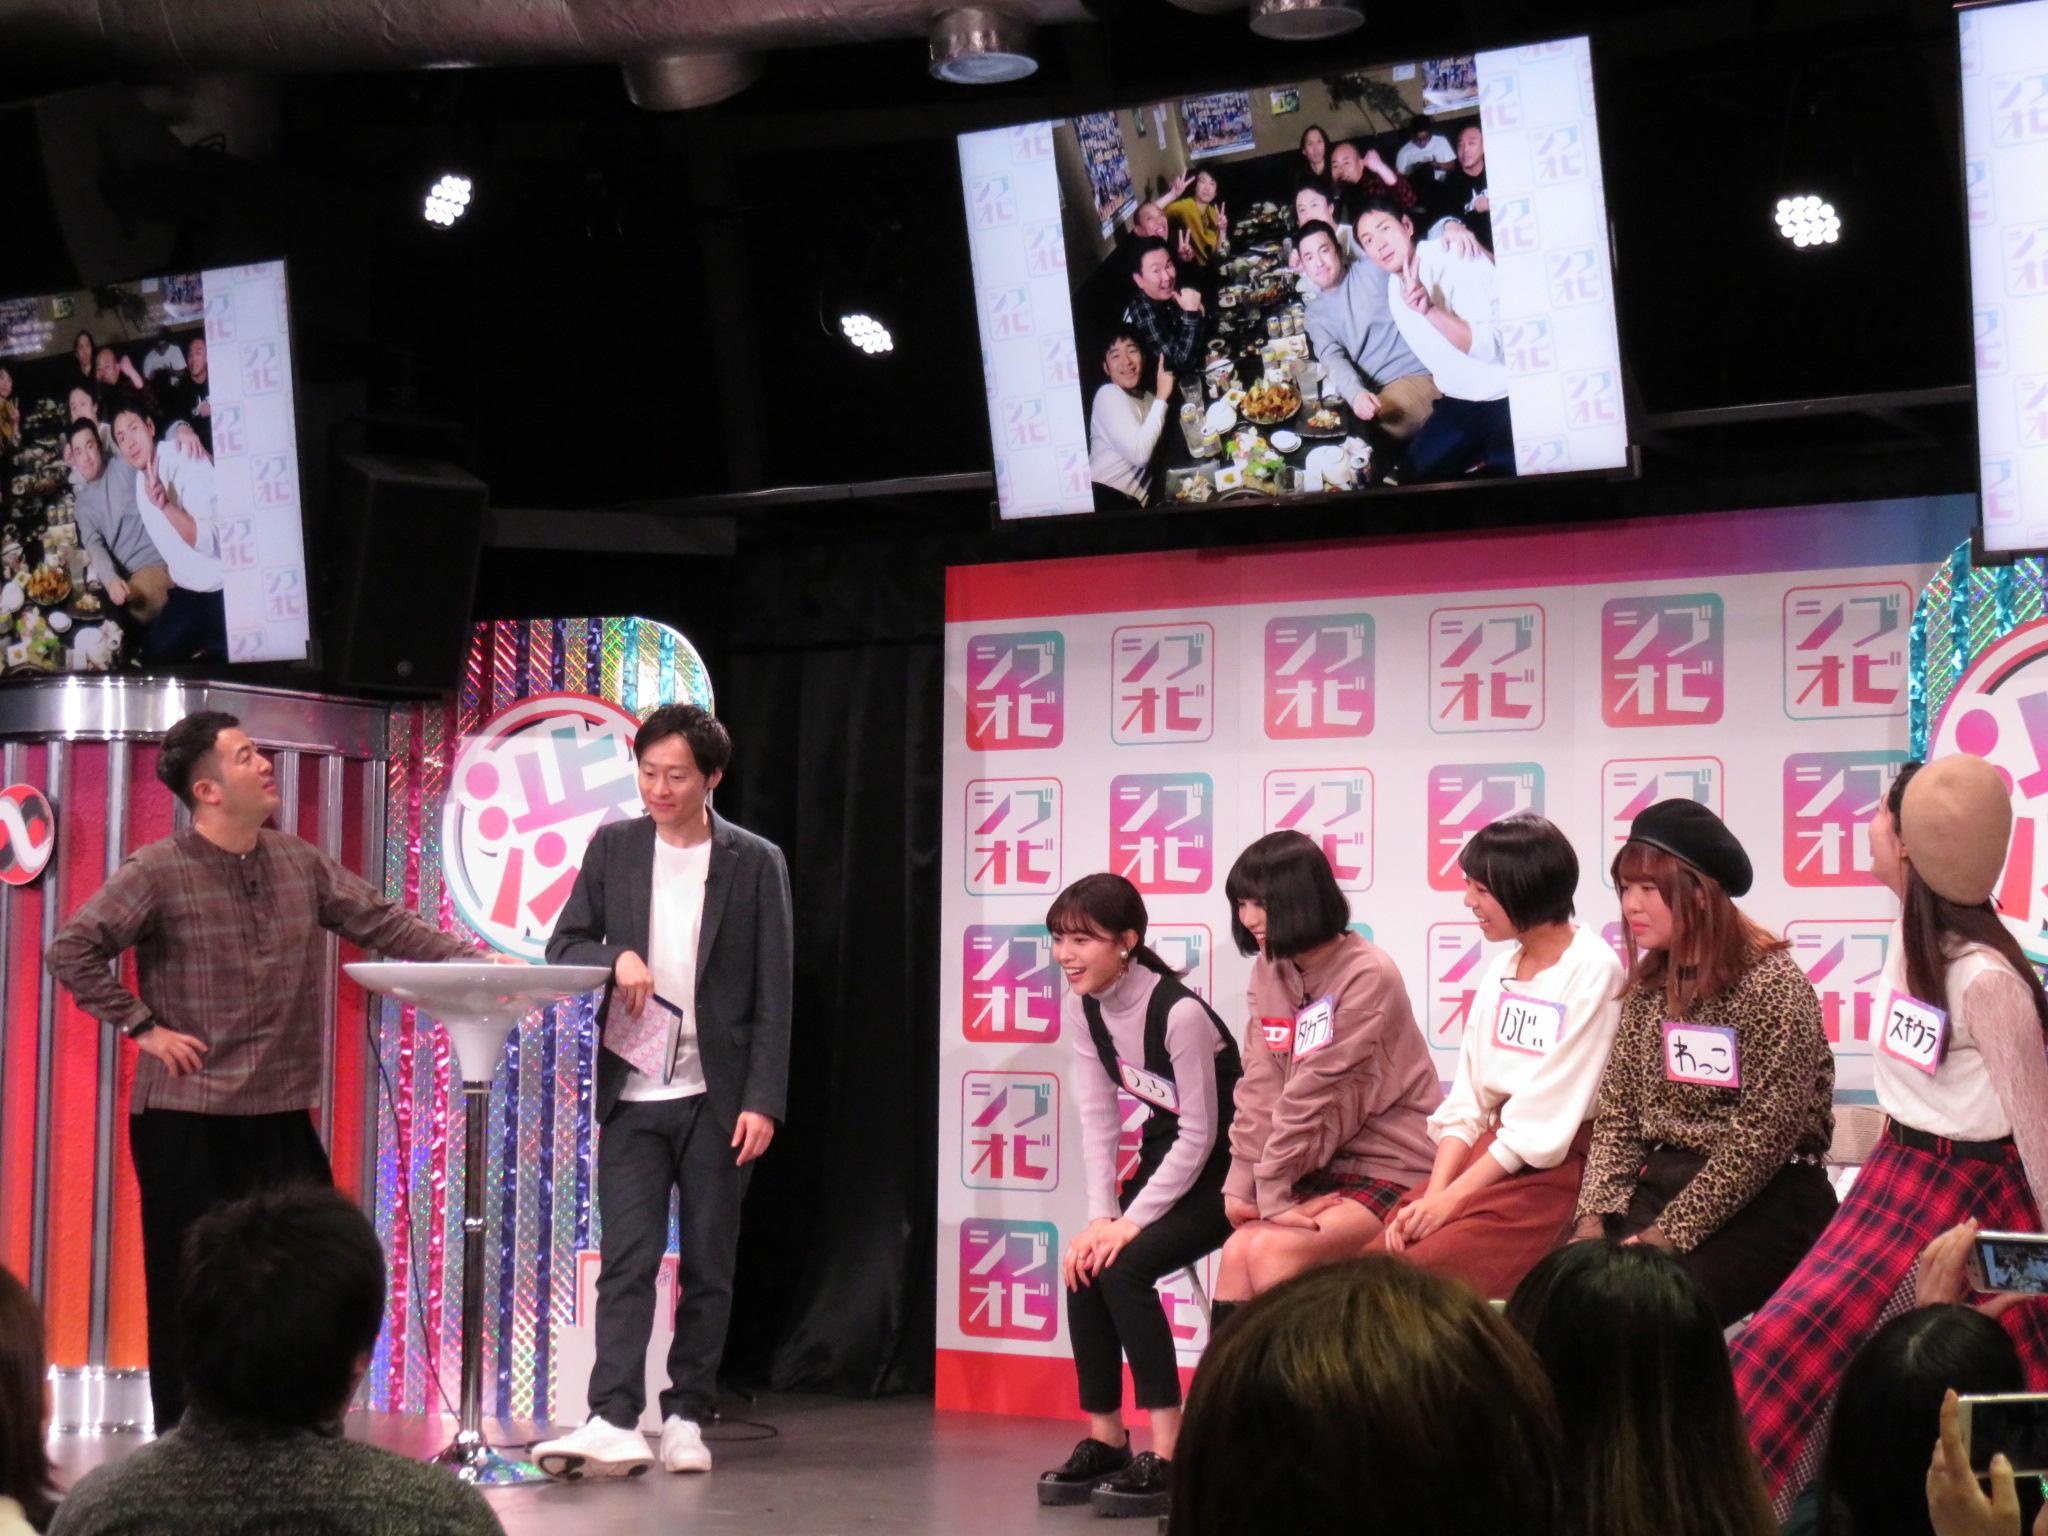 http://news.yoshimoto.co.jp/20181203202615-cfb01f496302379647f83fcc060de722d67bd8c9.jpg